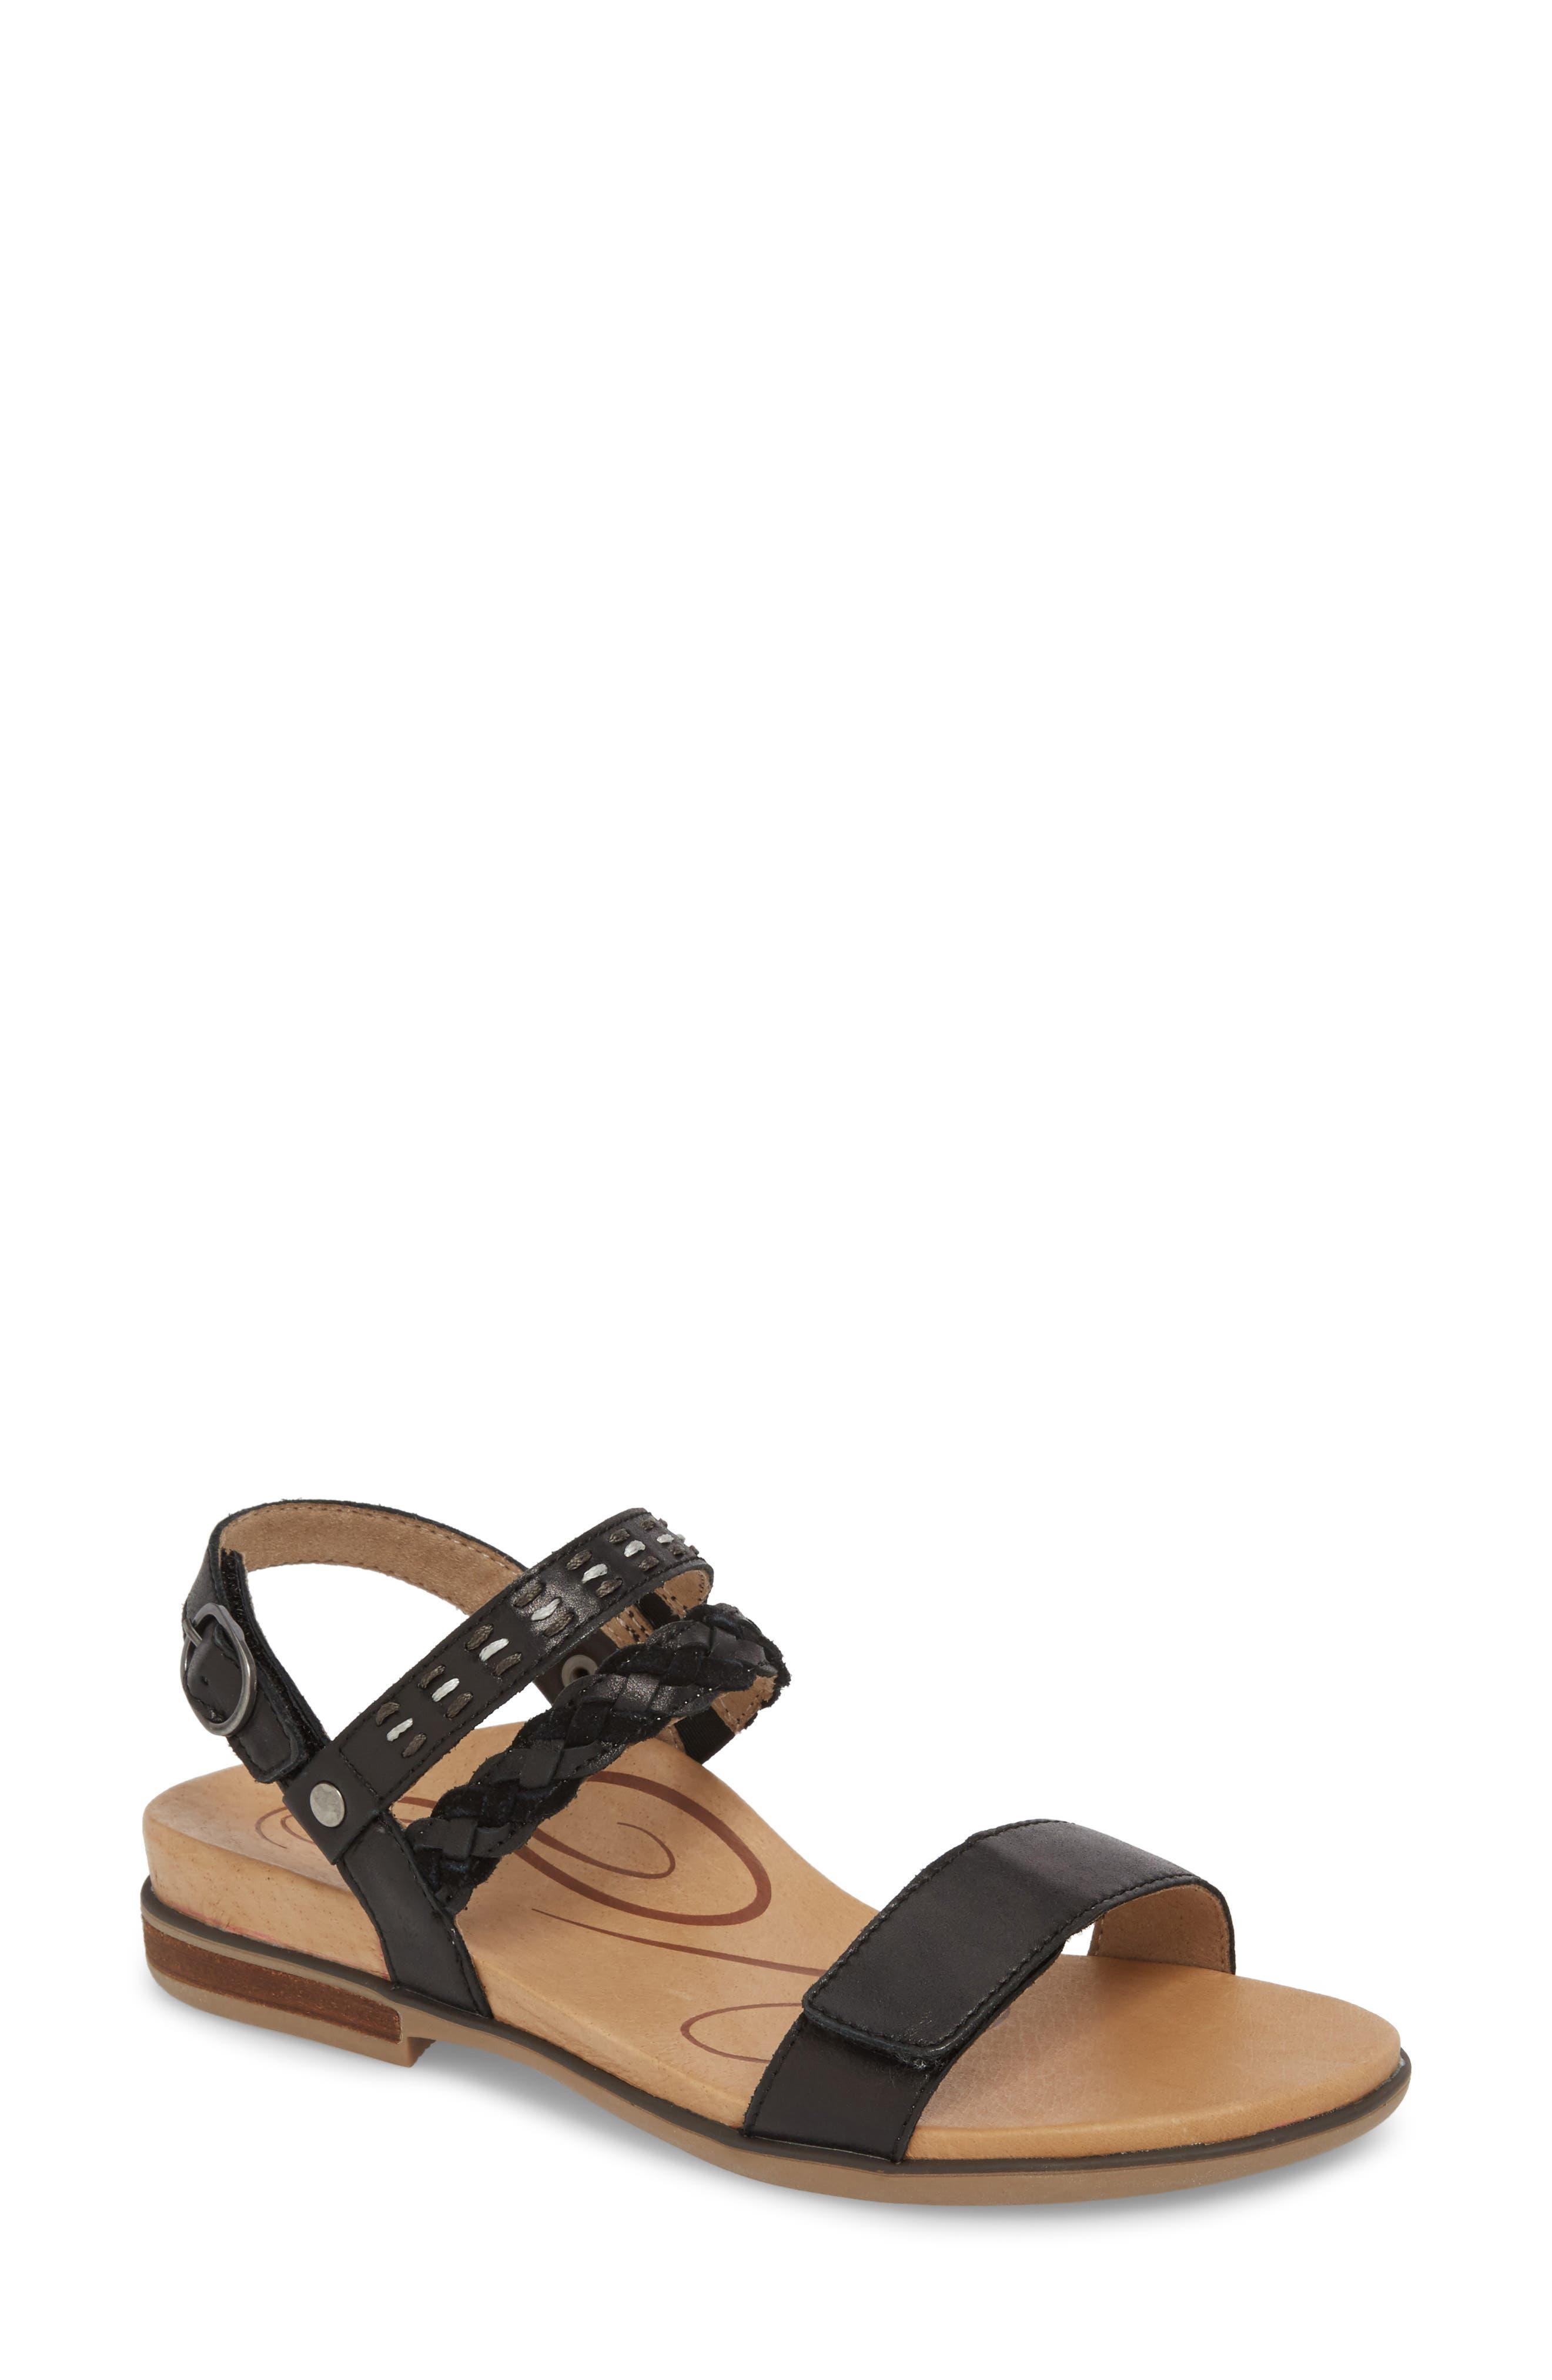 Celeste Sandal,                         Main,                         color, Black Leather